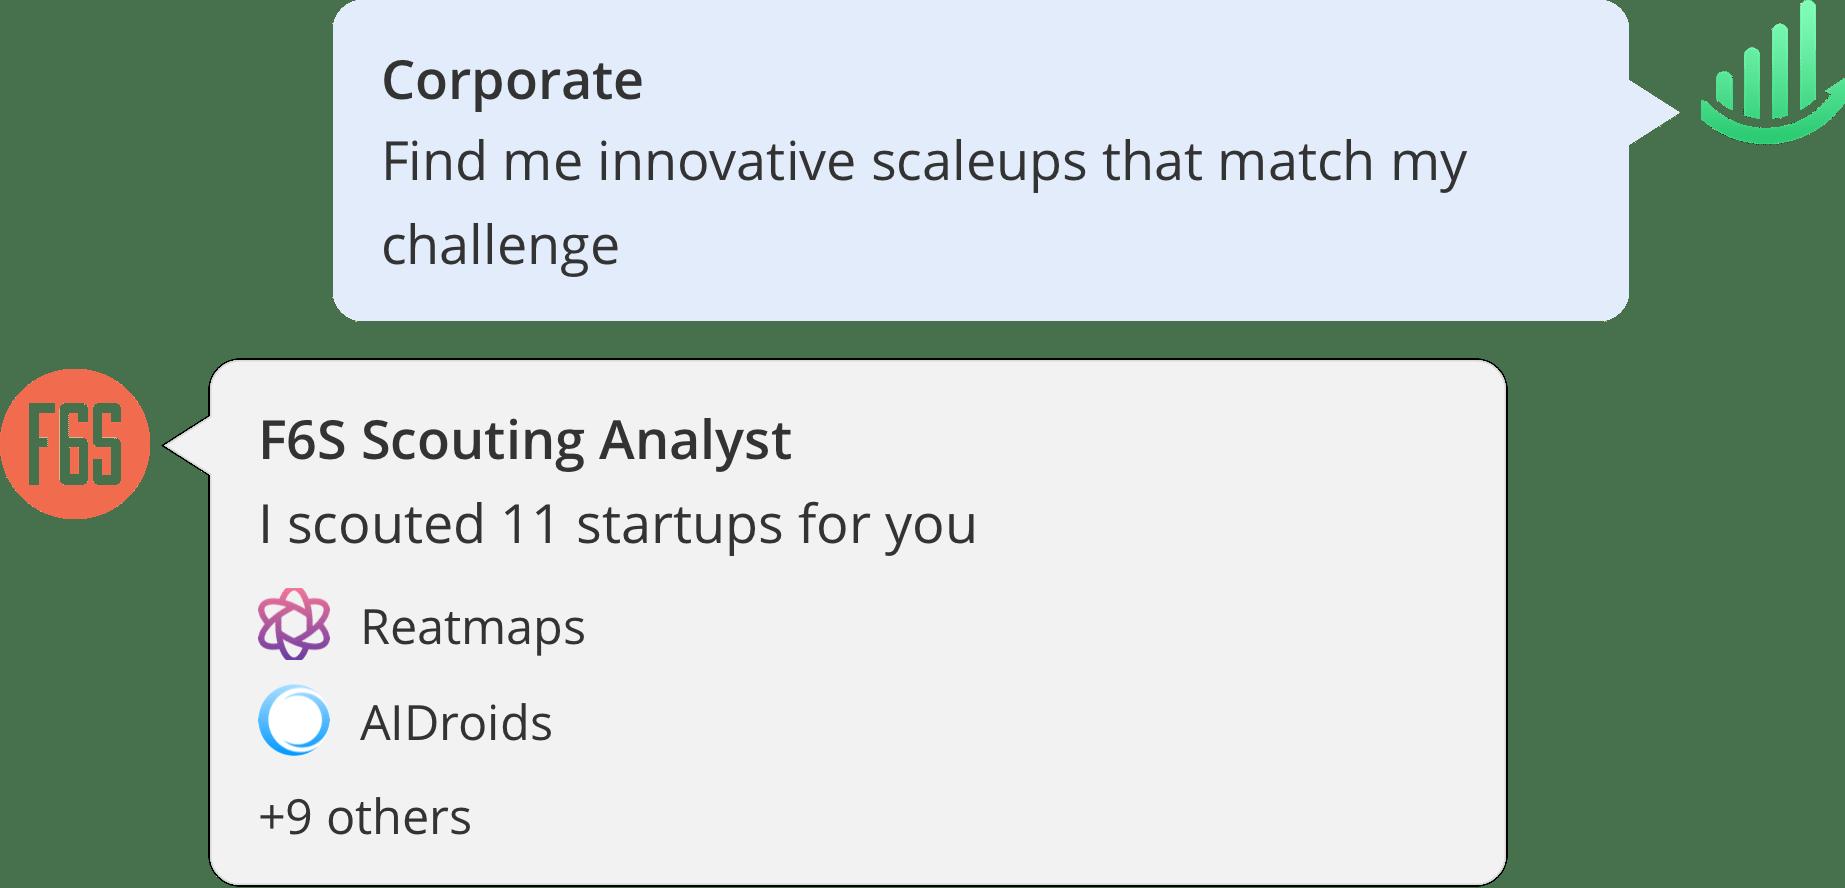 F6S Corporate Innovation